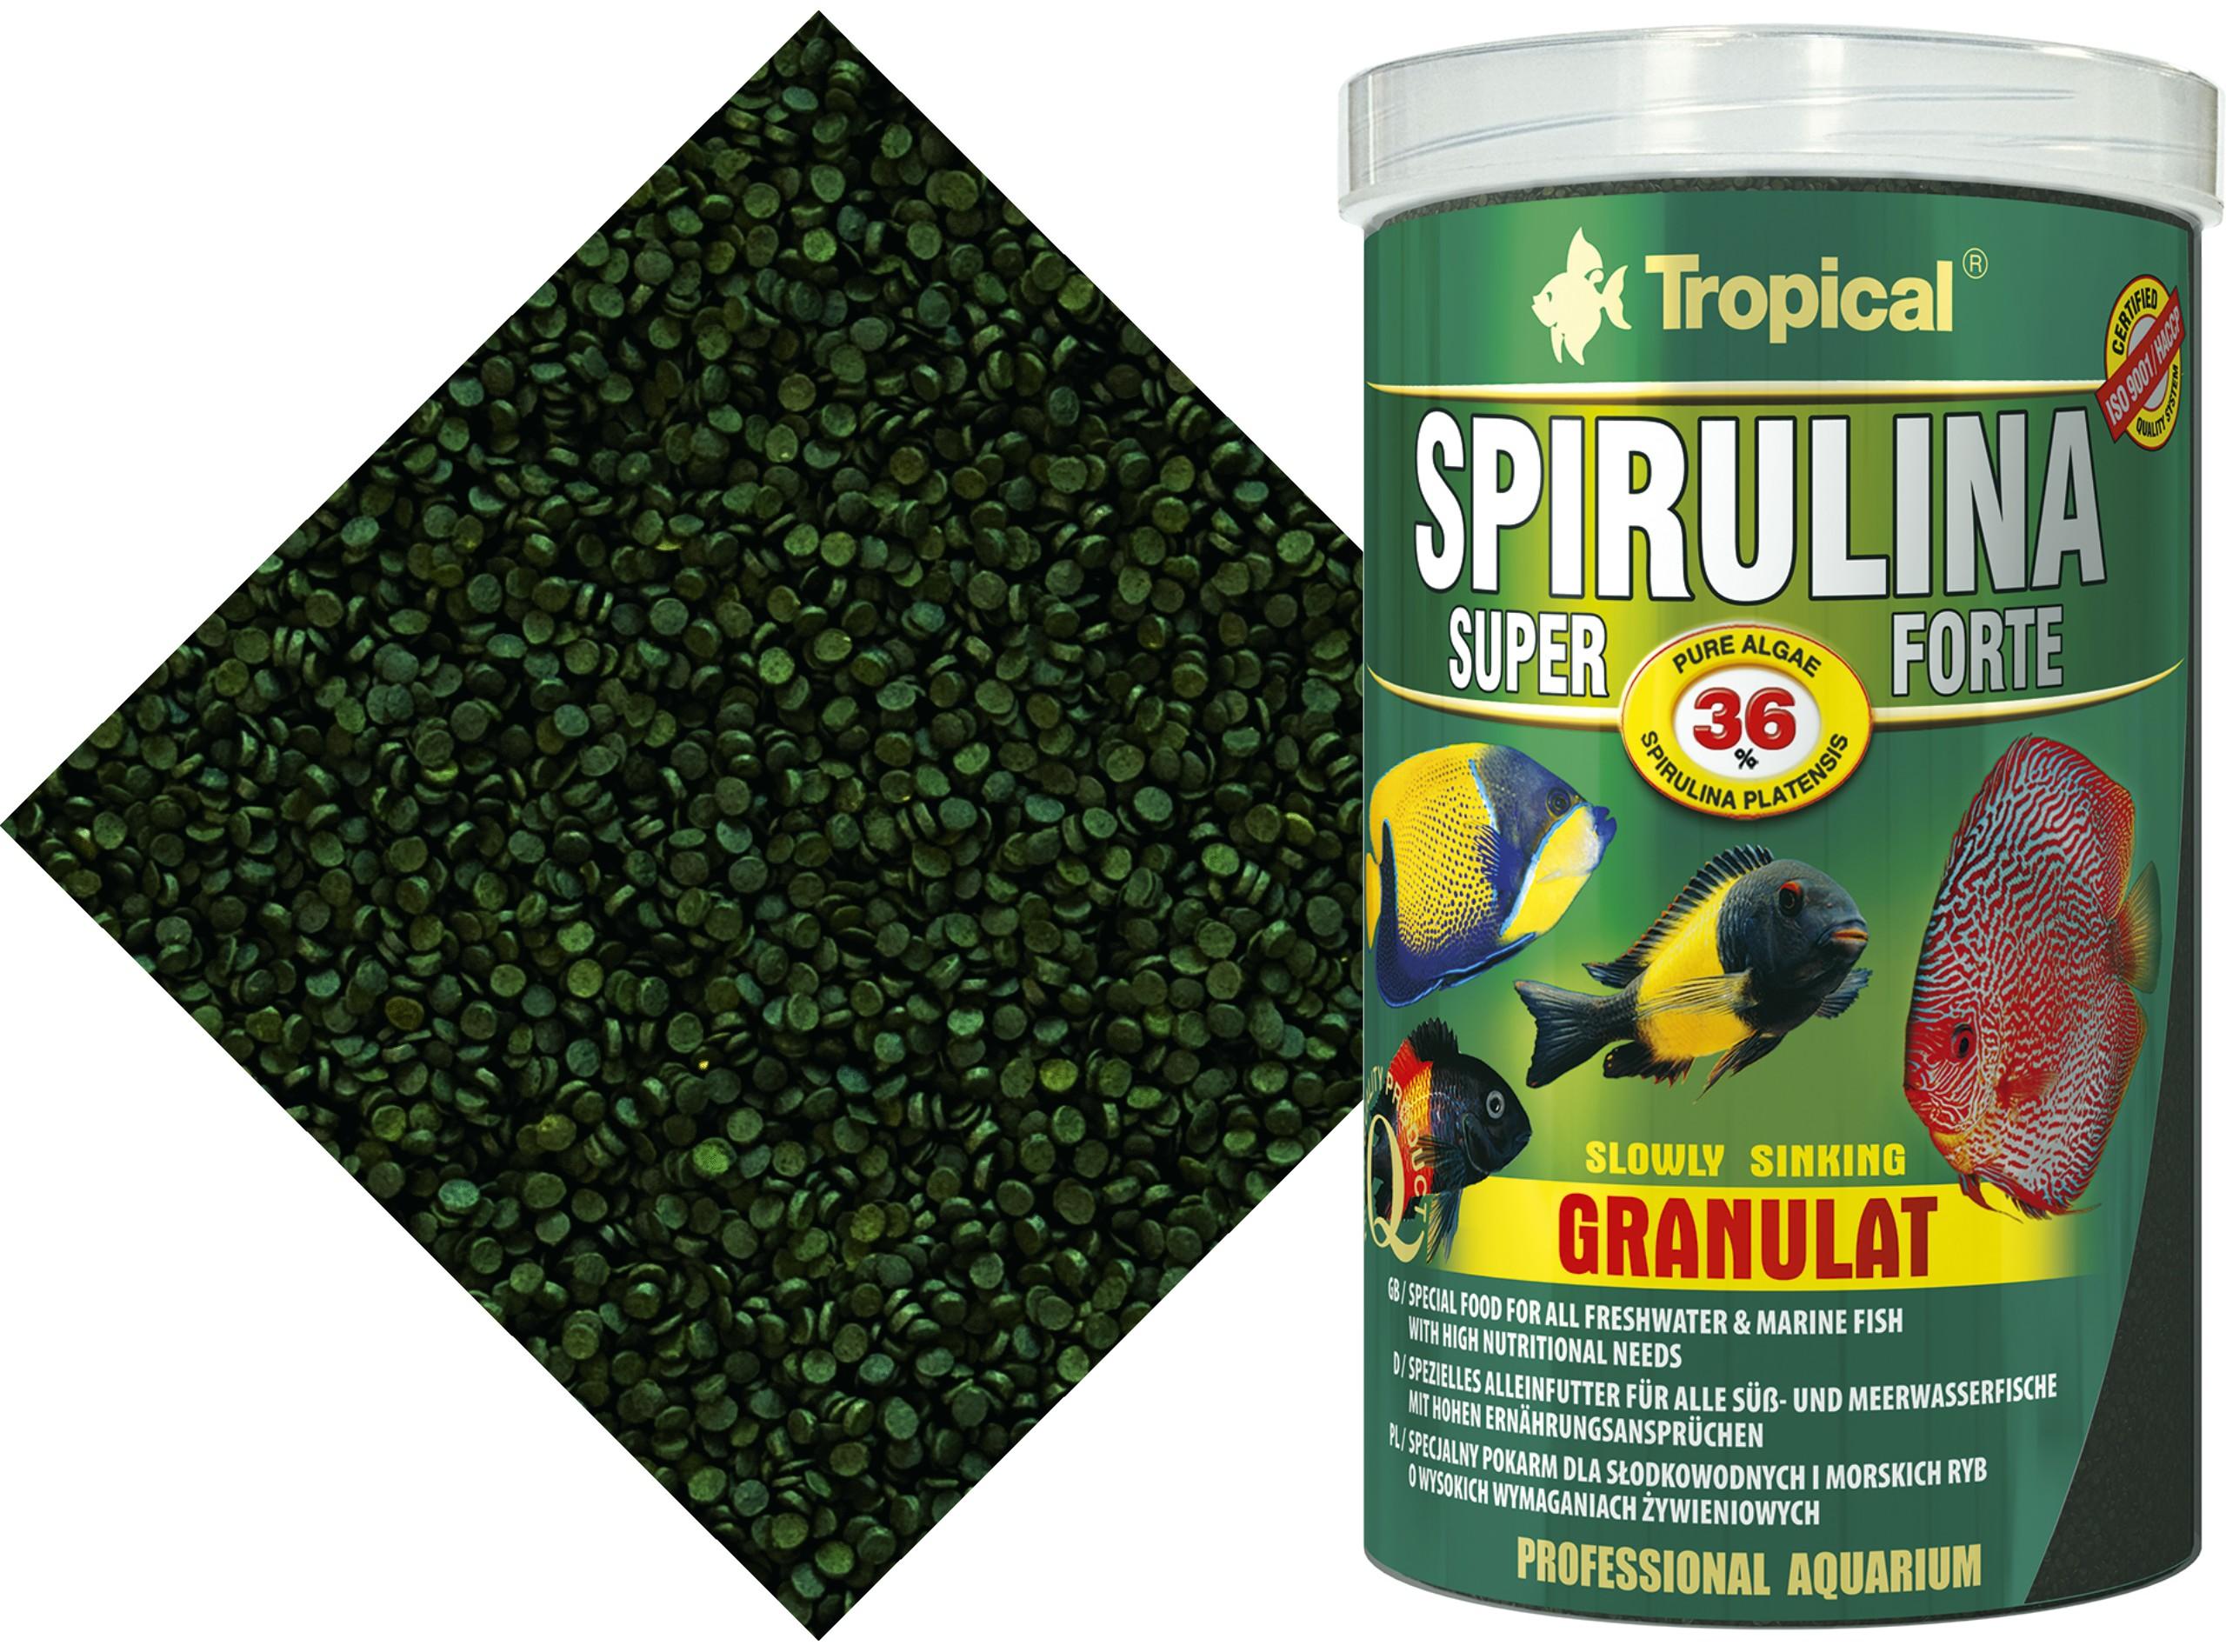 TROPICAL SPIRULINA SUPER FORTE 36% GRAND 400gr/1000